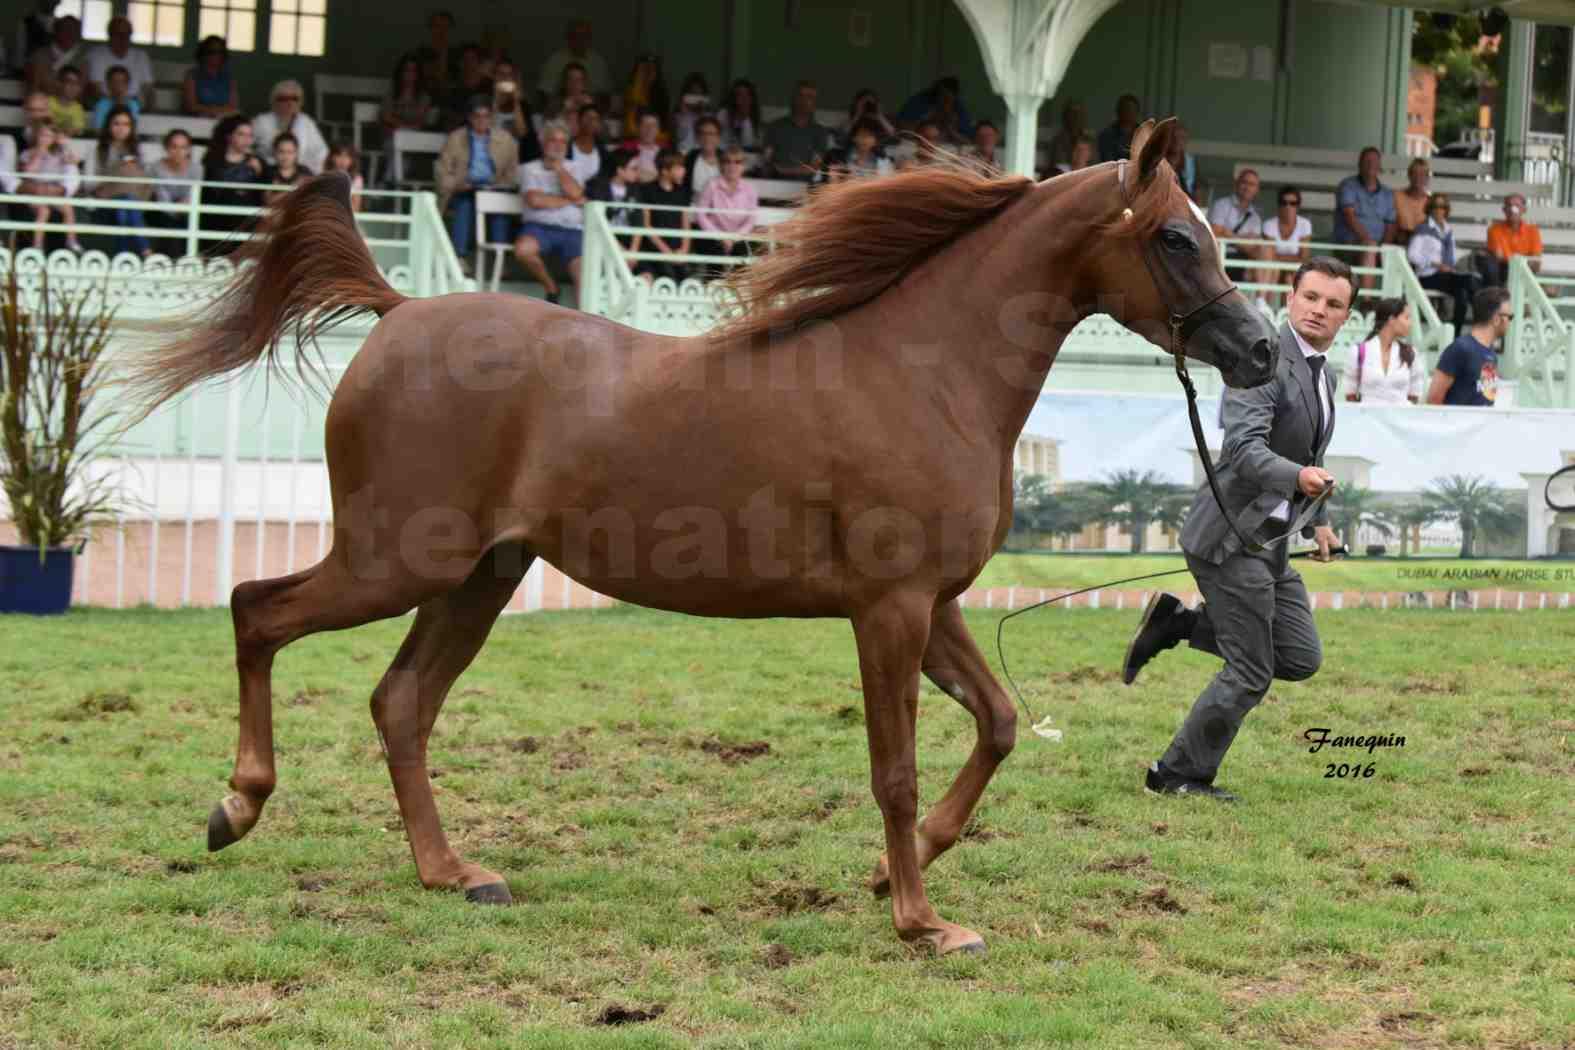 International Arabian Horse Show B de VICHY 2016 - PEARL DE DJOON - Notre Sélection - 15